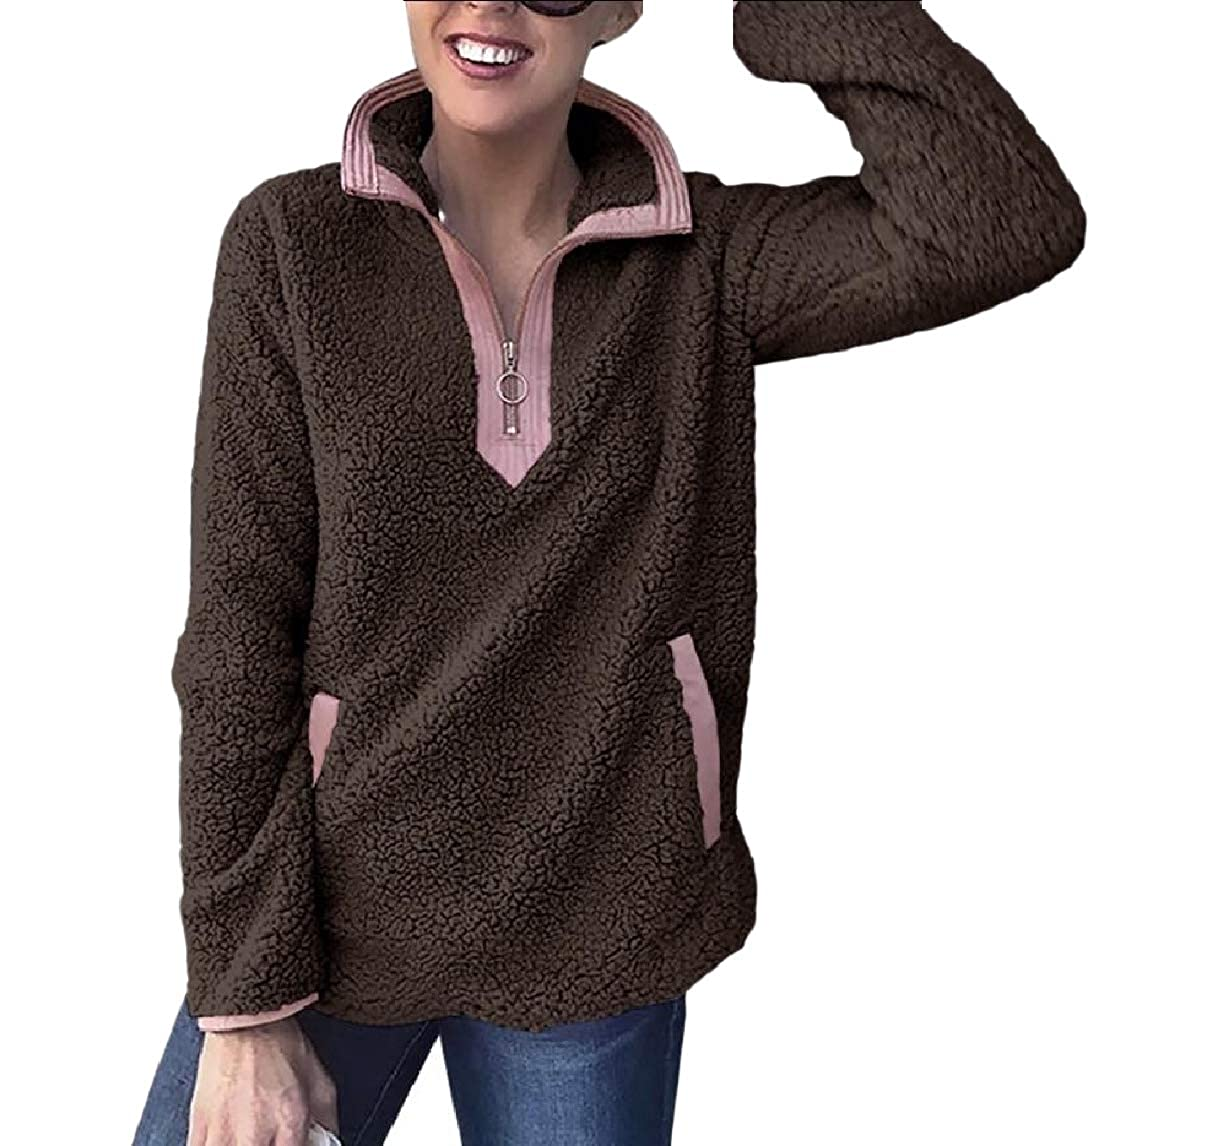 RDHOPE-Women Shaggy Fall Plus Size Soft Warm Casual Sweatshirts Blouse